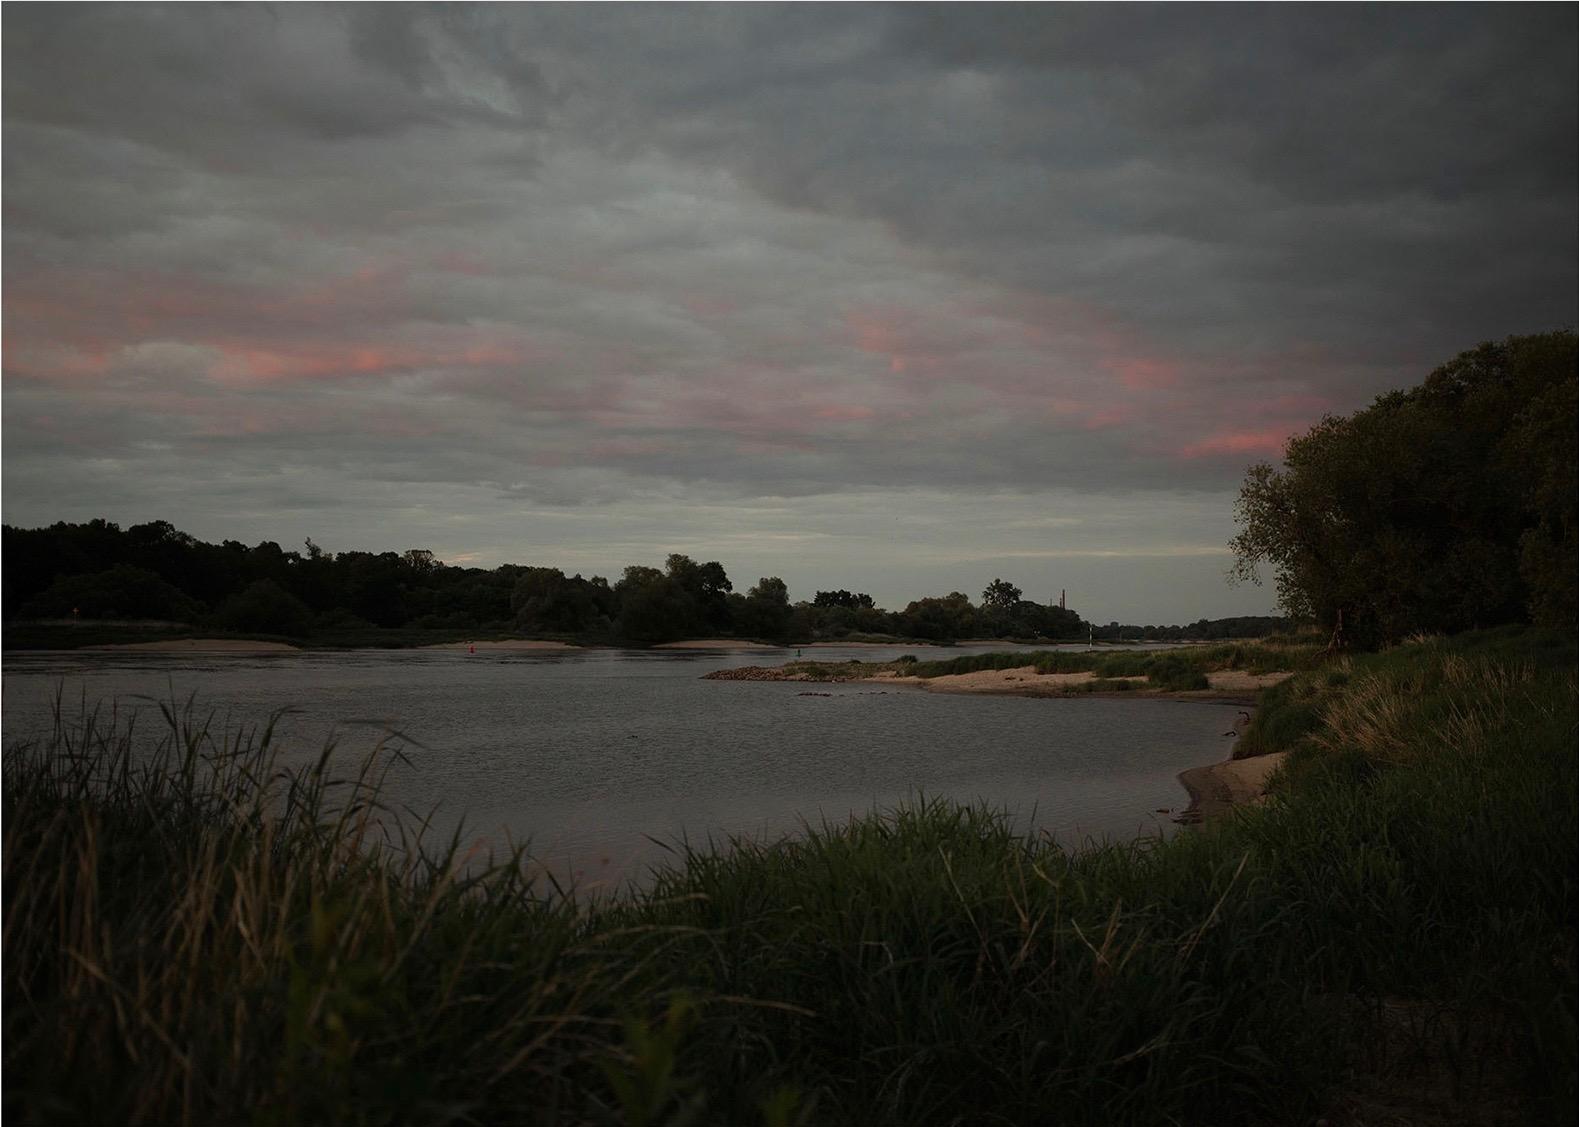 photo, photos, photography, photographer, photographers, lake, lakes, river, rivers, sunset, dusk, beach, sand, marsh, landscape